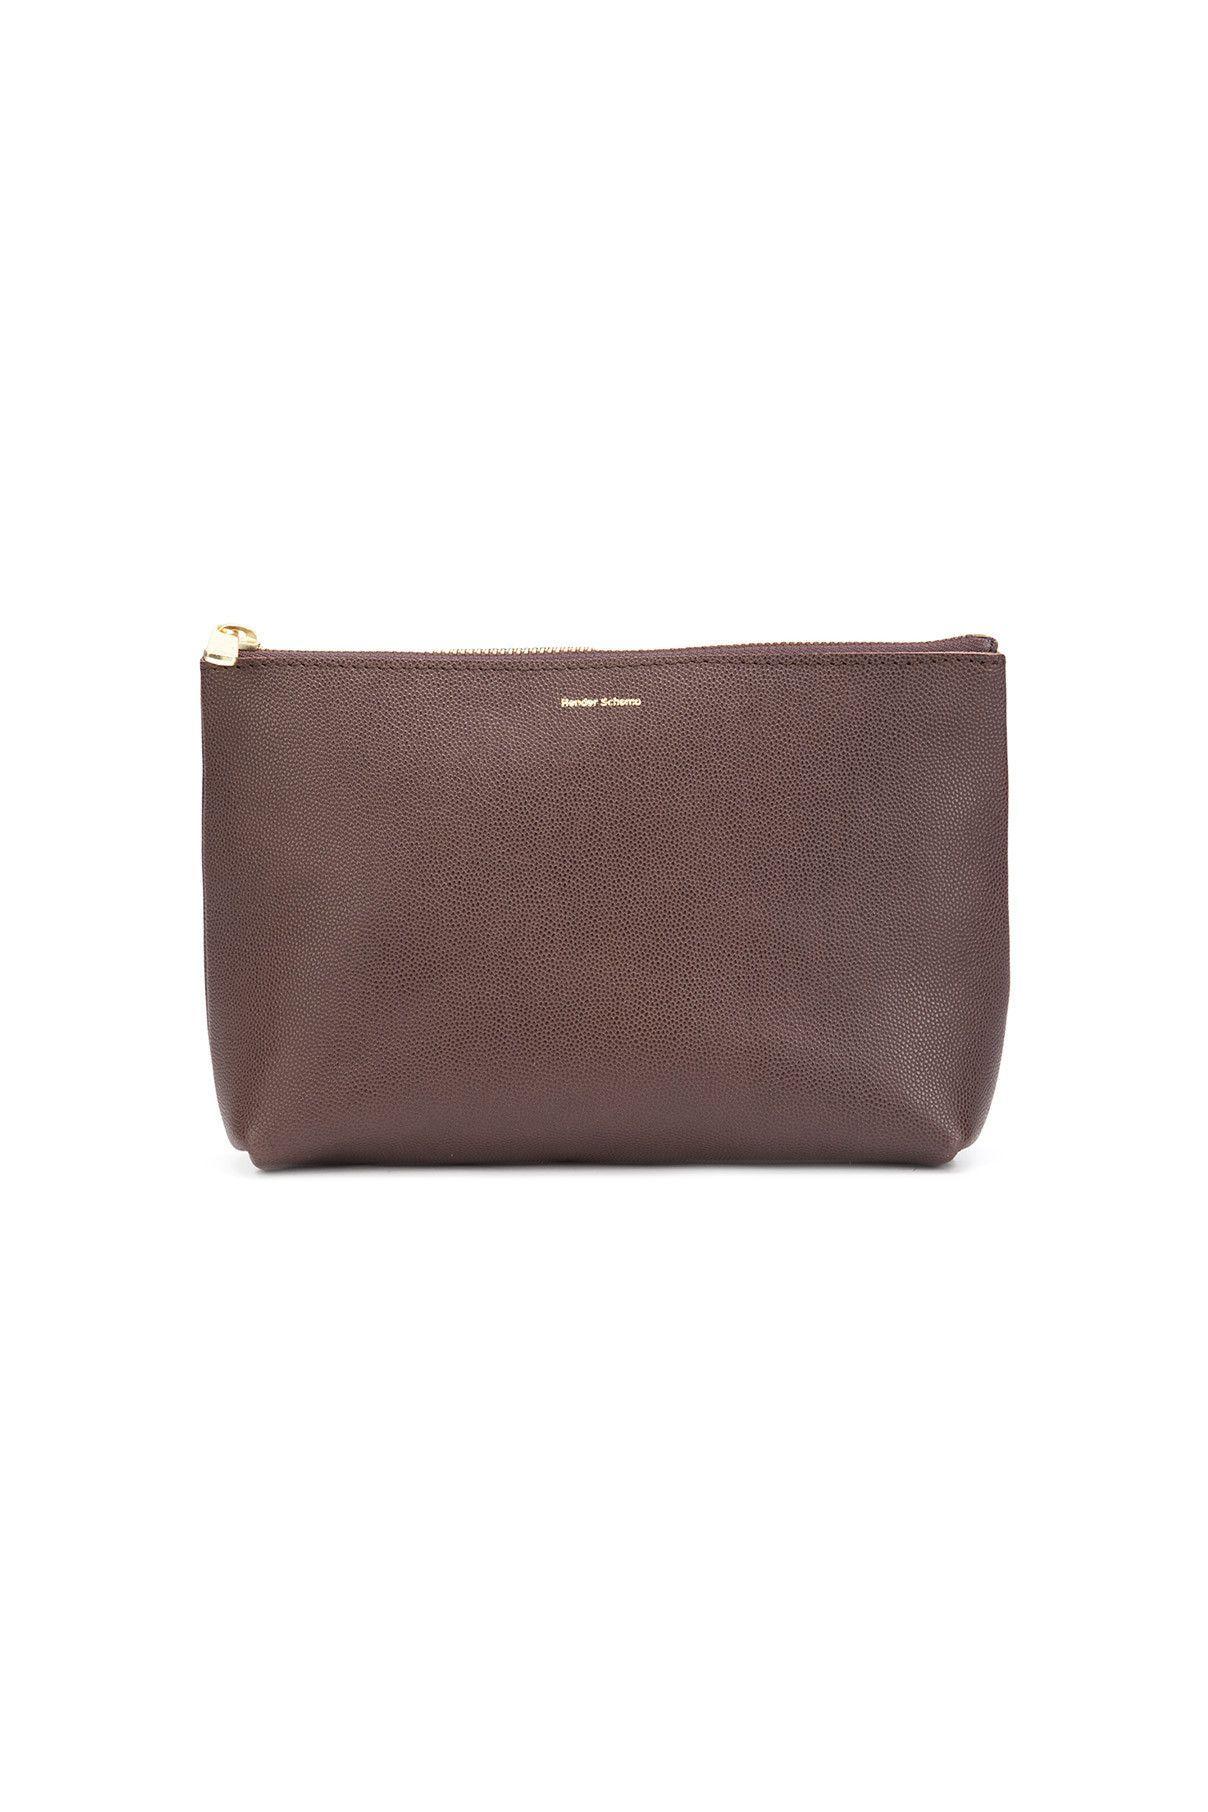 {Hender Scheme / 05 accessory / 05 pouch} Medium Zipped Pouch